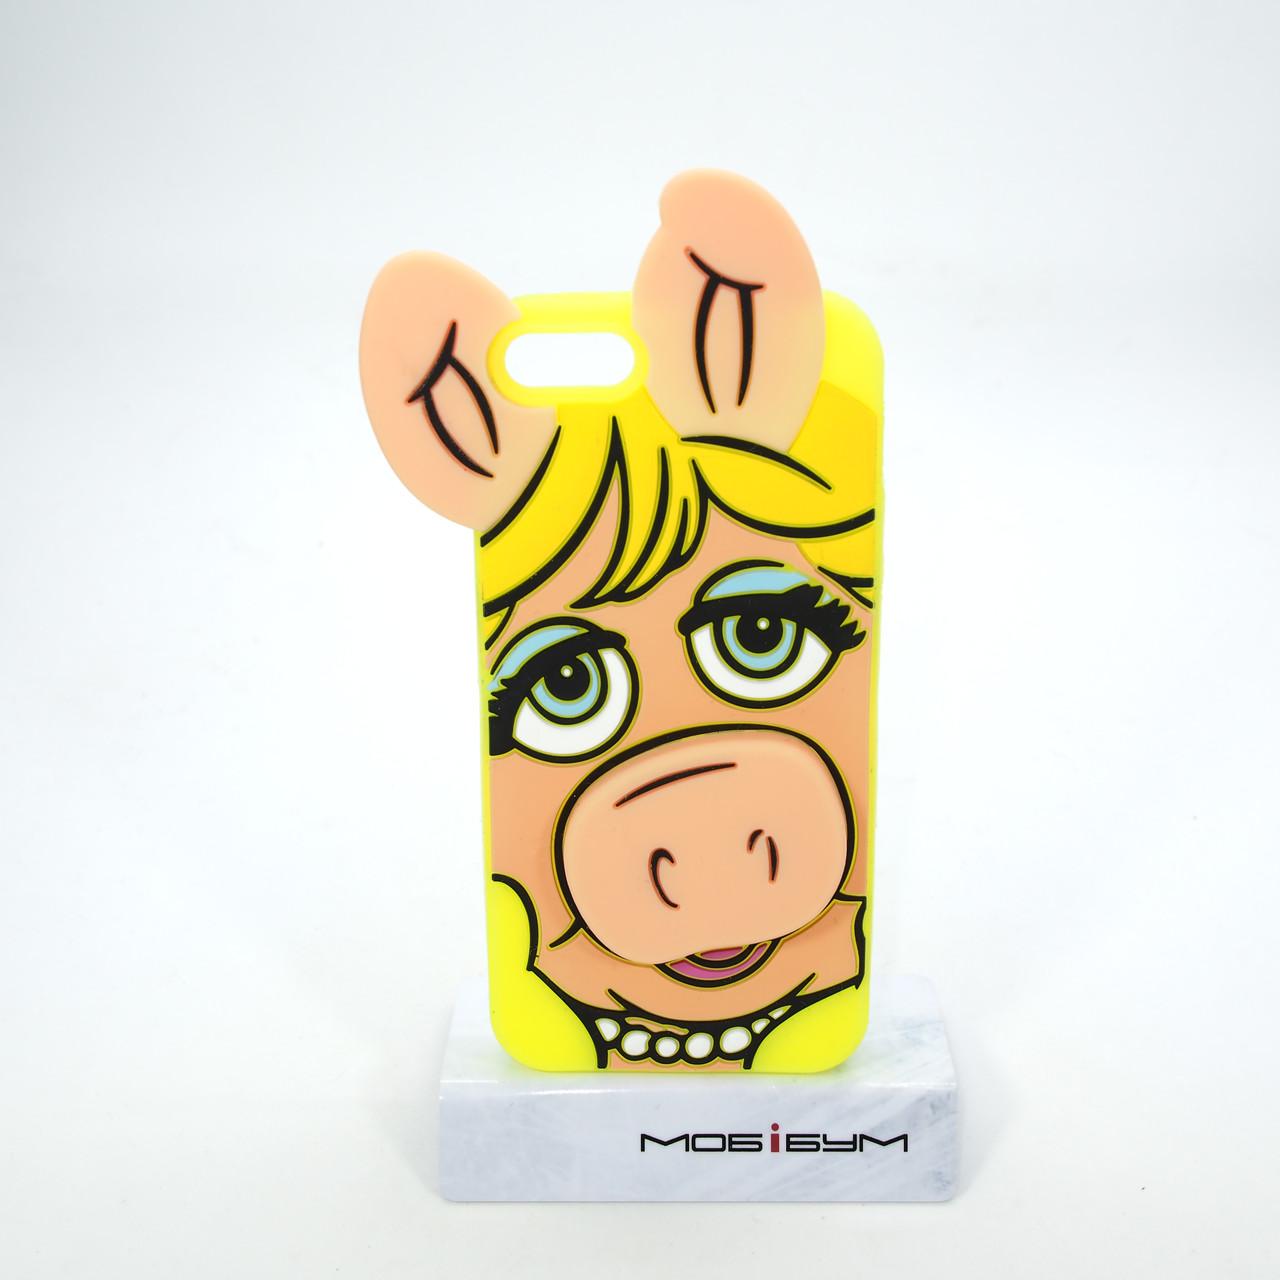 Чехол Silicon Moschino iPhone 5s/SE Pig yellow